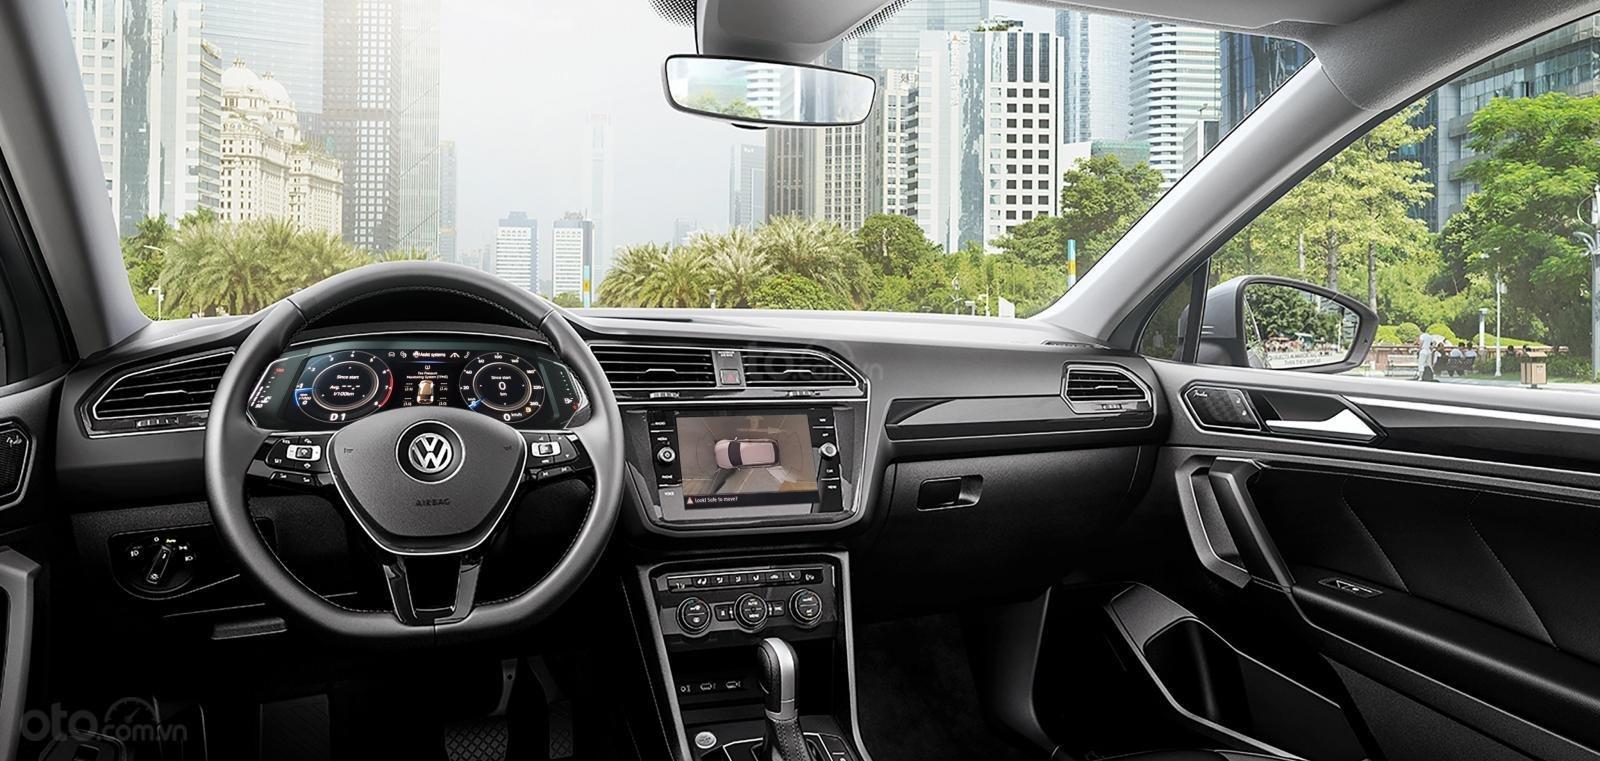 VW Tiguan Allspace Luxury 2019 - Đủ màu giao ngay. Hotline: 090-898-8862-4